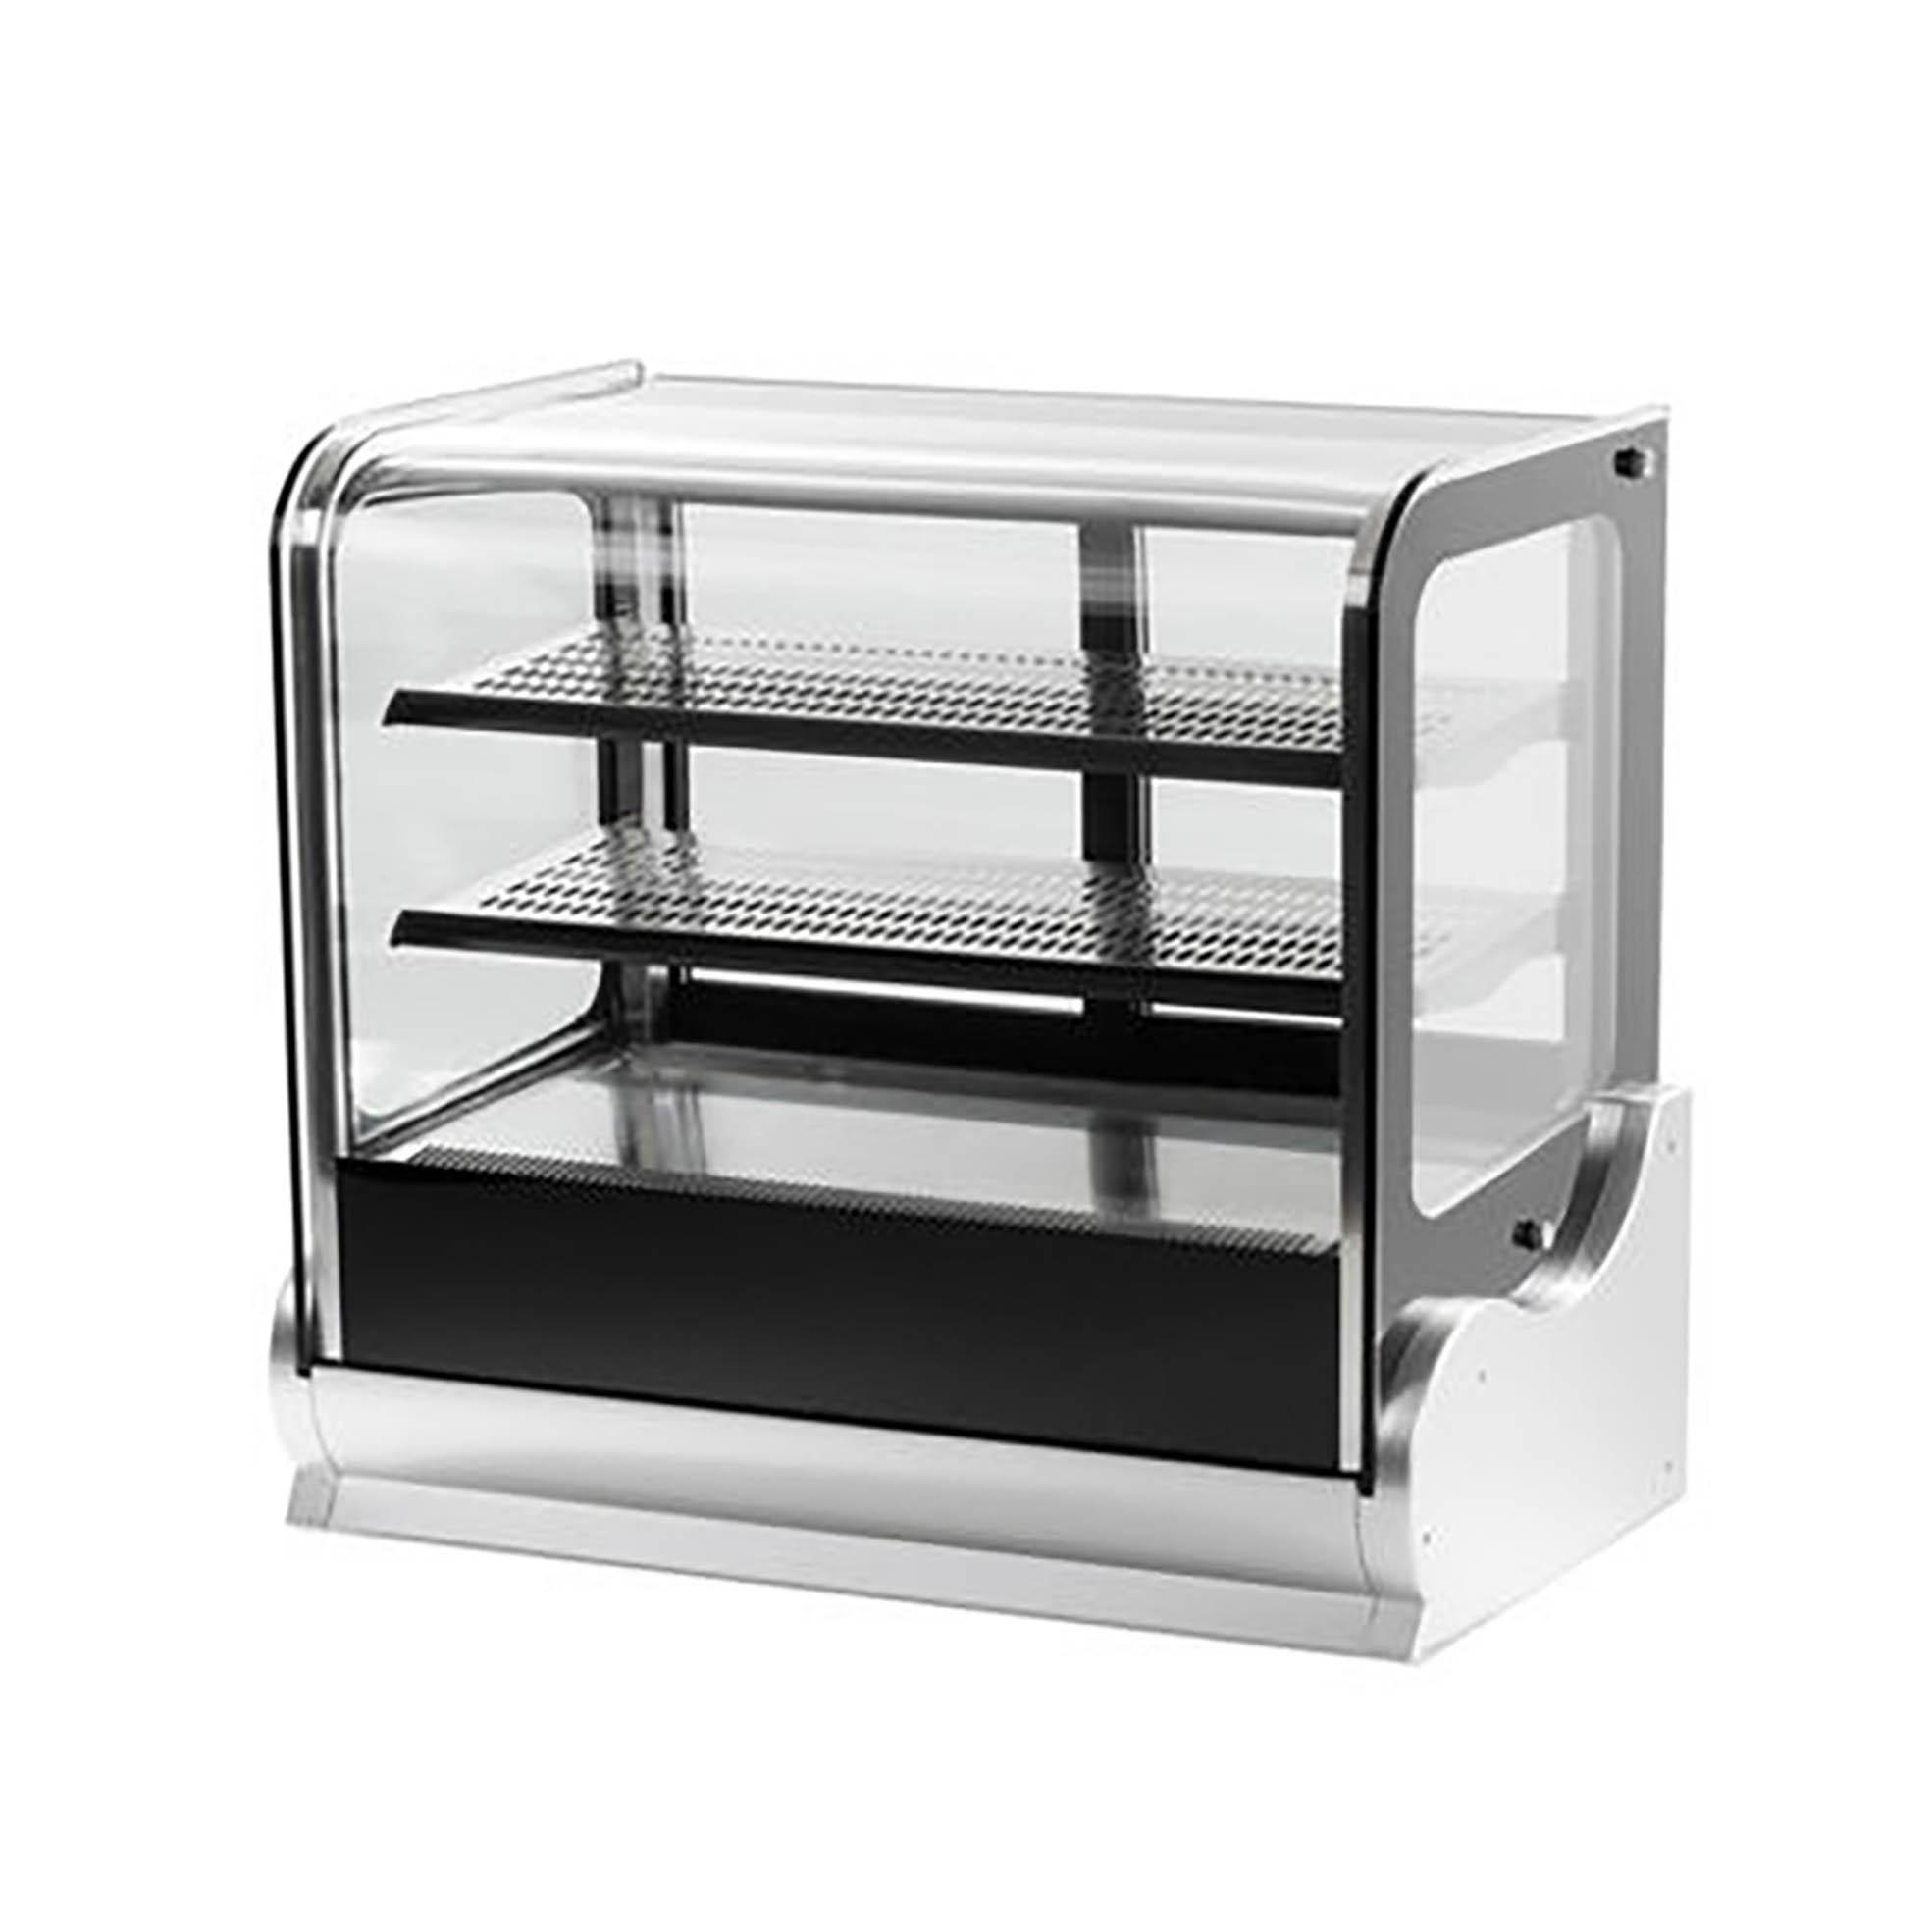 jsp countertop counter original refrigerators steel appliances refrigerator stainless web inch display tif whirlpool french door depth view